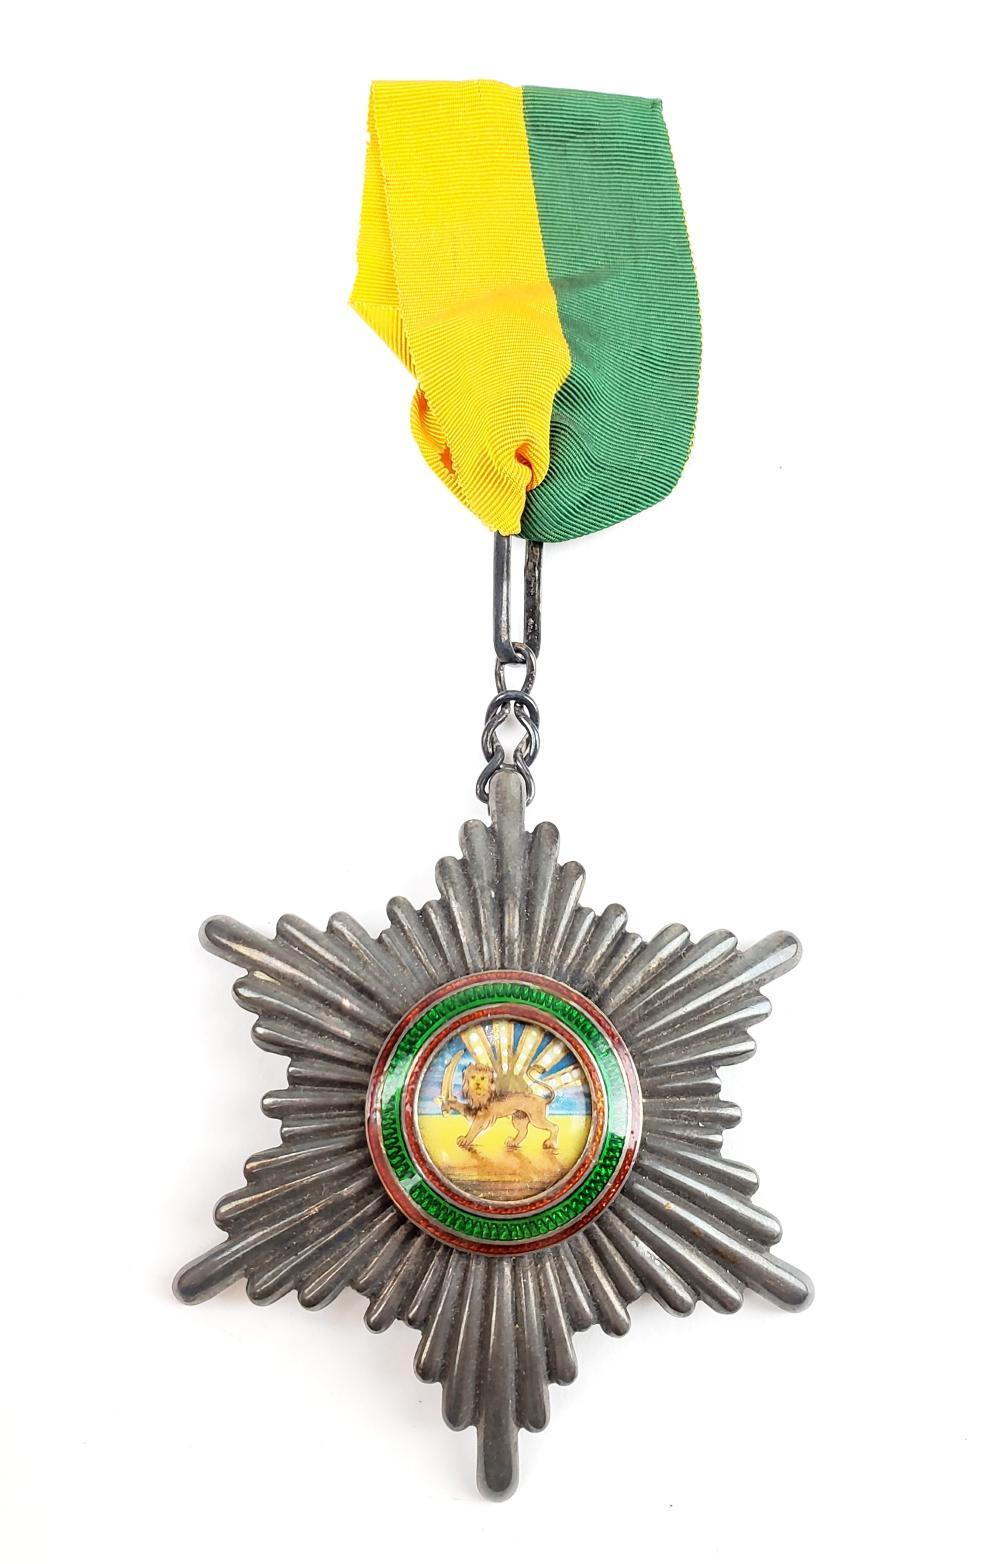 Palhavi Sterling Silver Enameled Lion & Sun Medal by Arthus Bertnard Paris